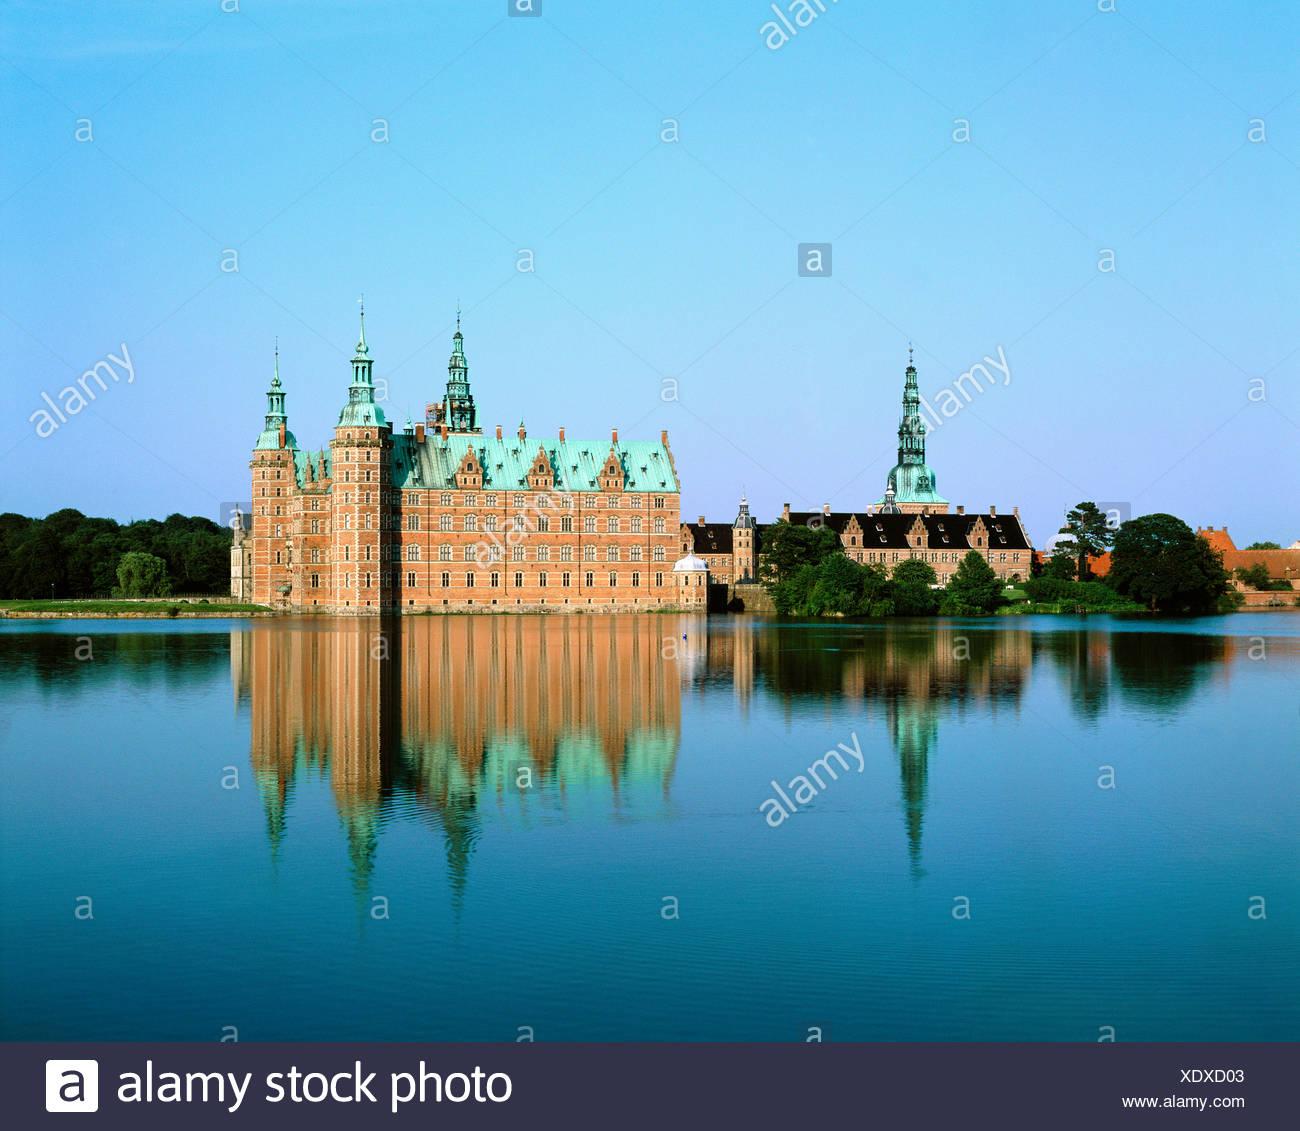 Dinamarca Europa Hillerod castillo renacentista Castillo moated Frederiksborg Imagen De Stock